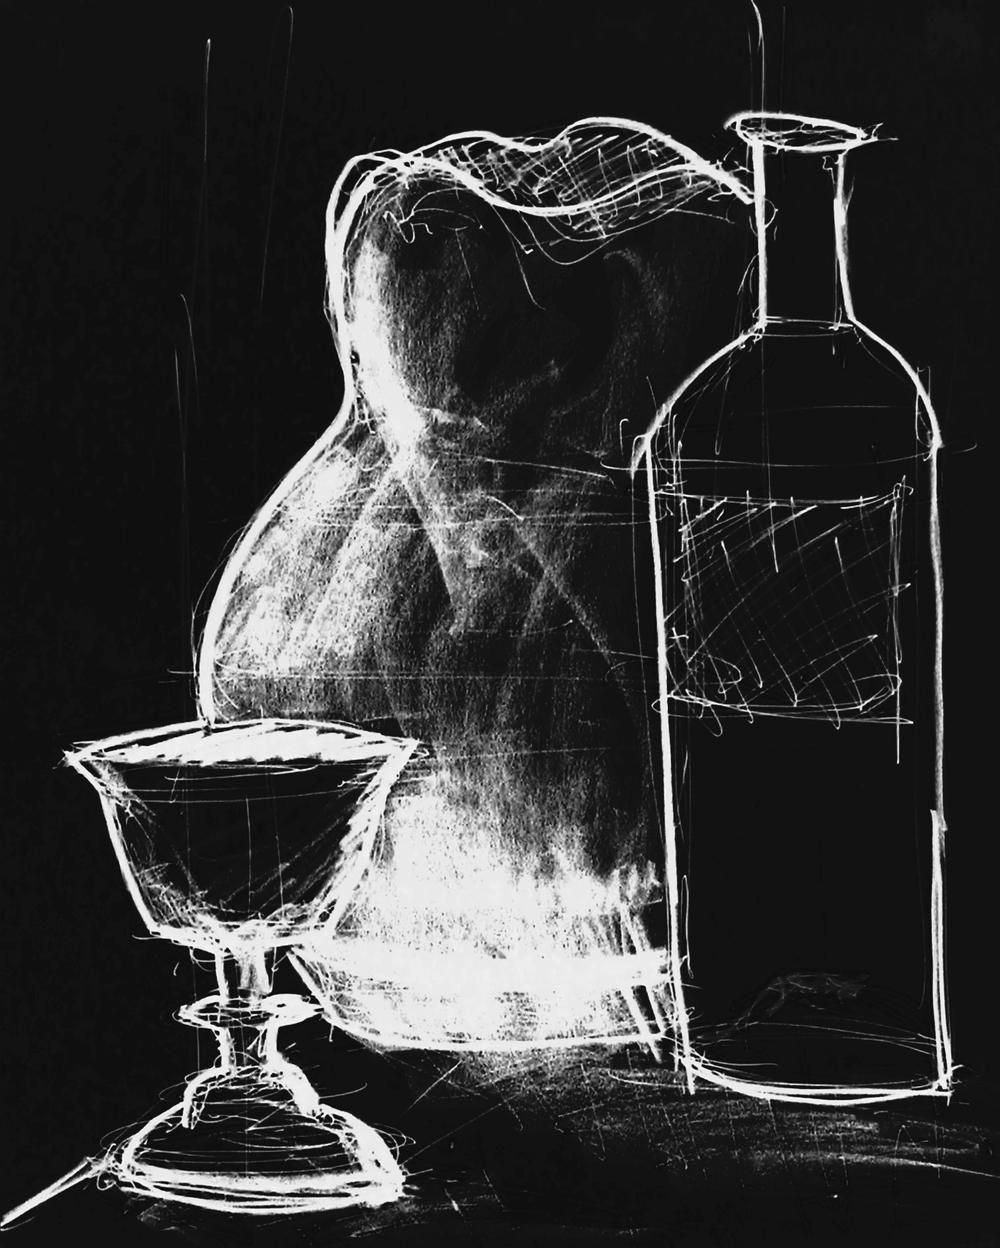 Still Life with Wine_b&w.jpg